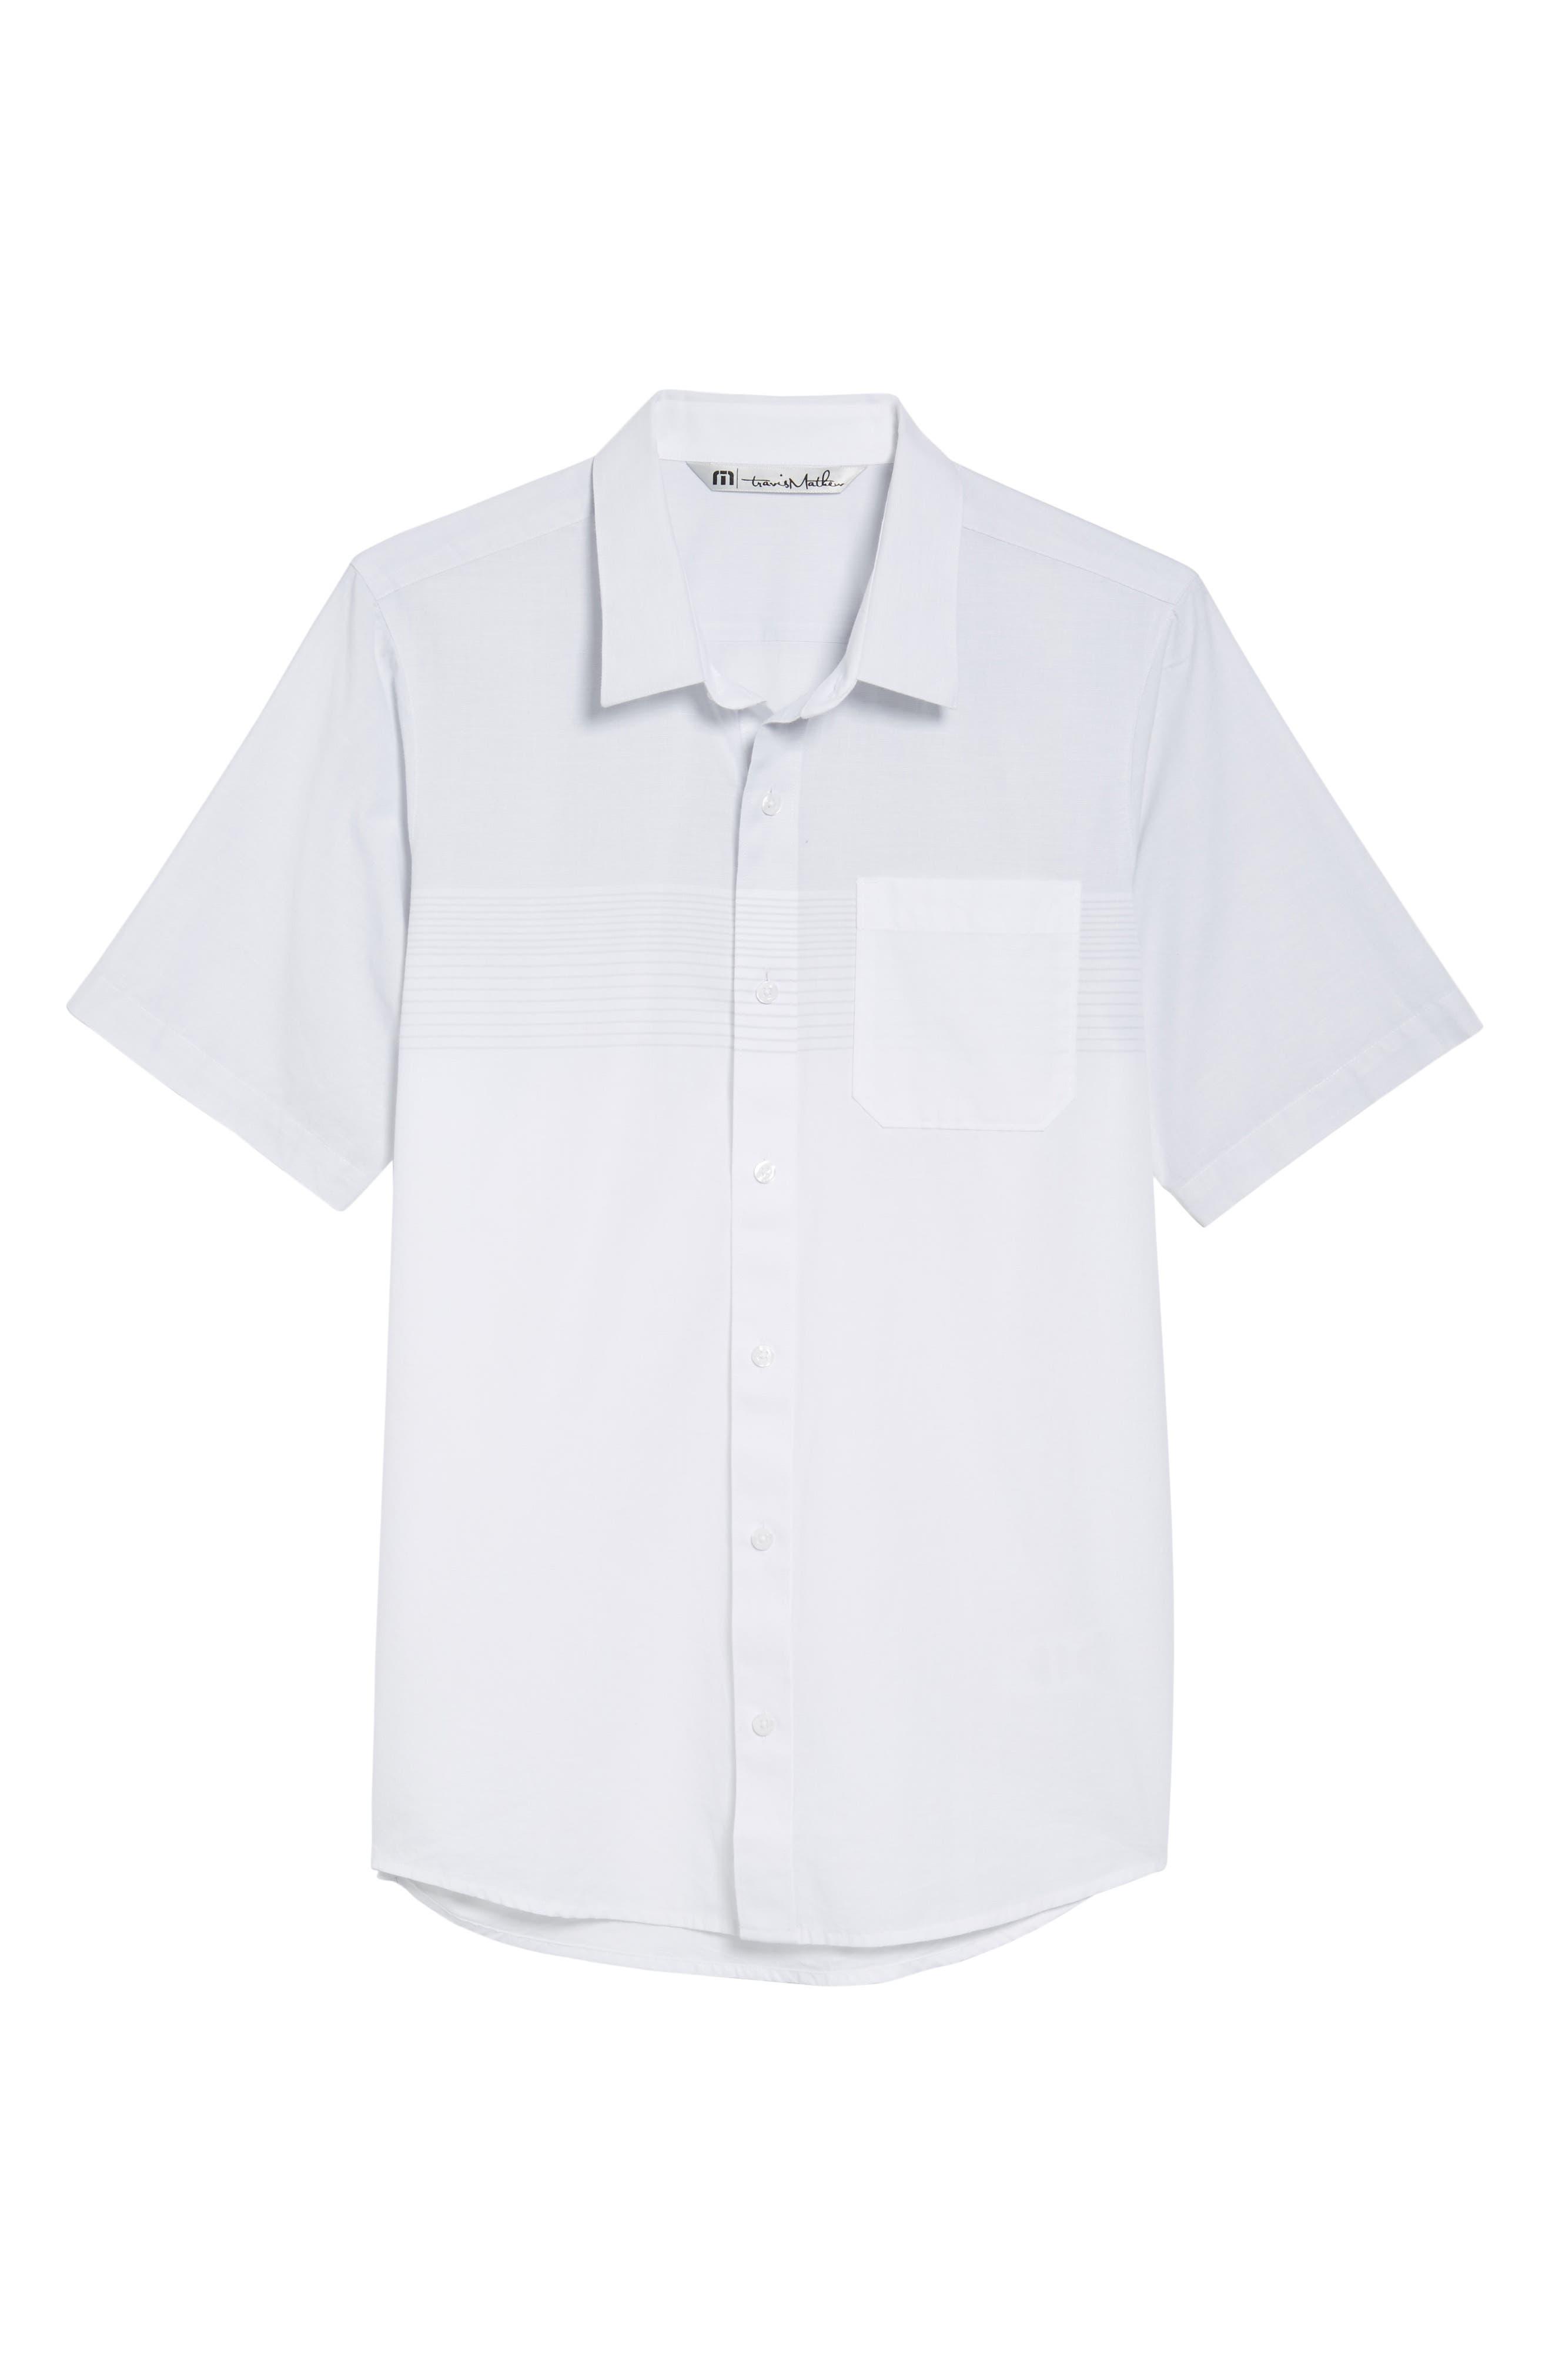 Charlie Pinstripe Woven Shirt,                             Alternate thumbnail 6, color,                             100